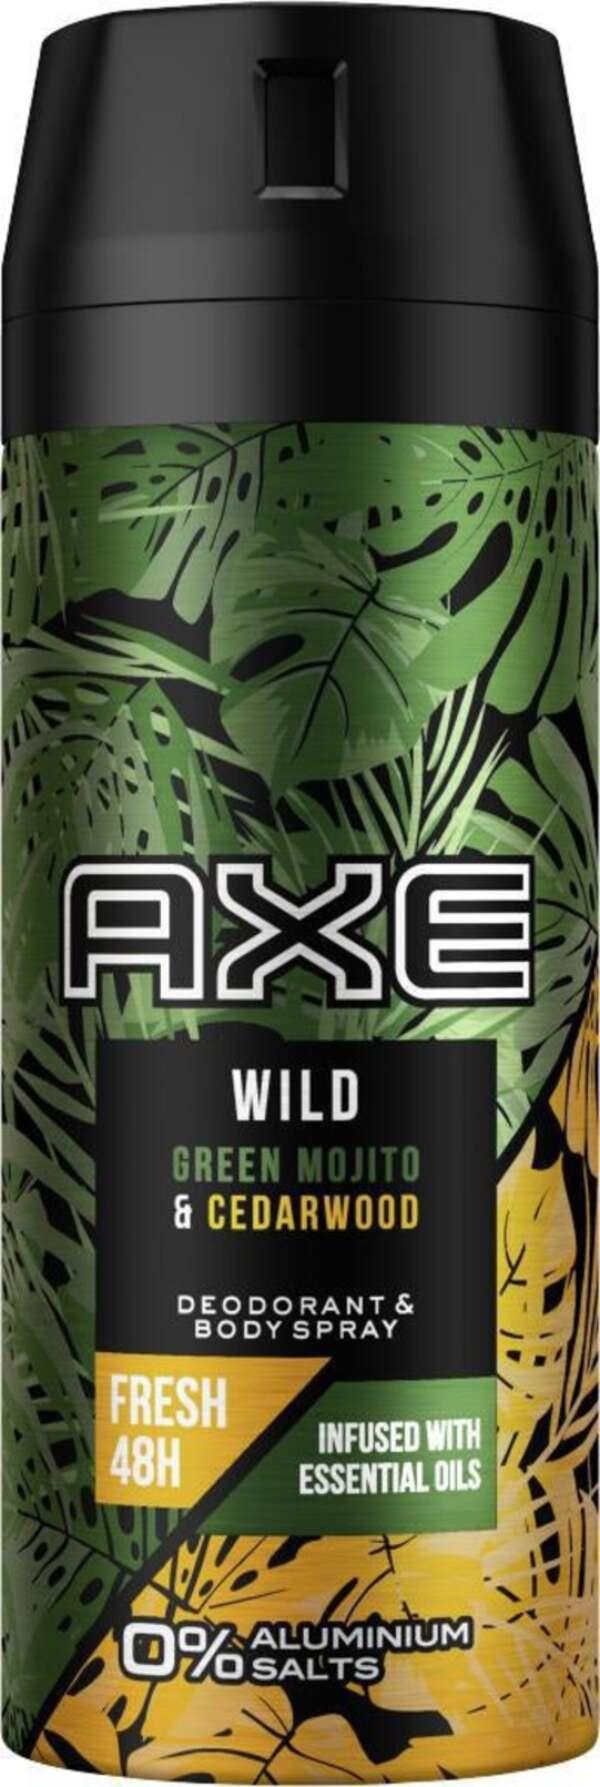 AXE Deodorant & Bodyspray Wild Green Mojito & Cedarwood